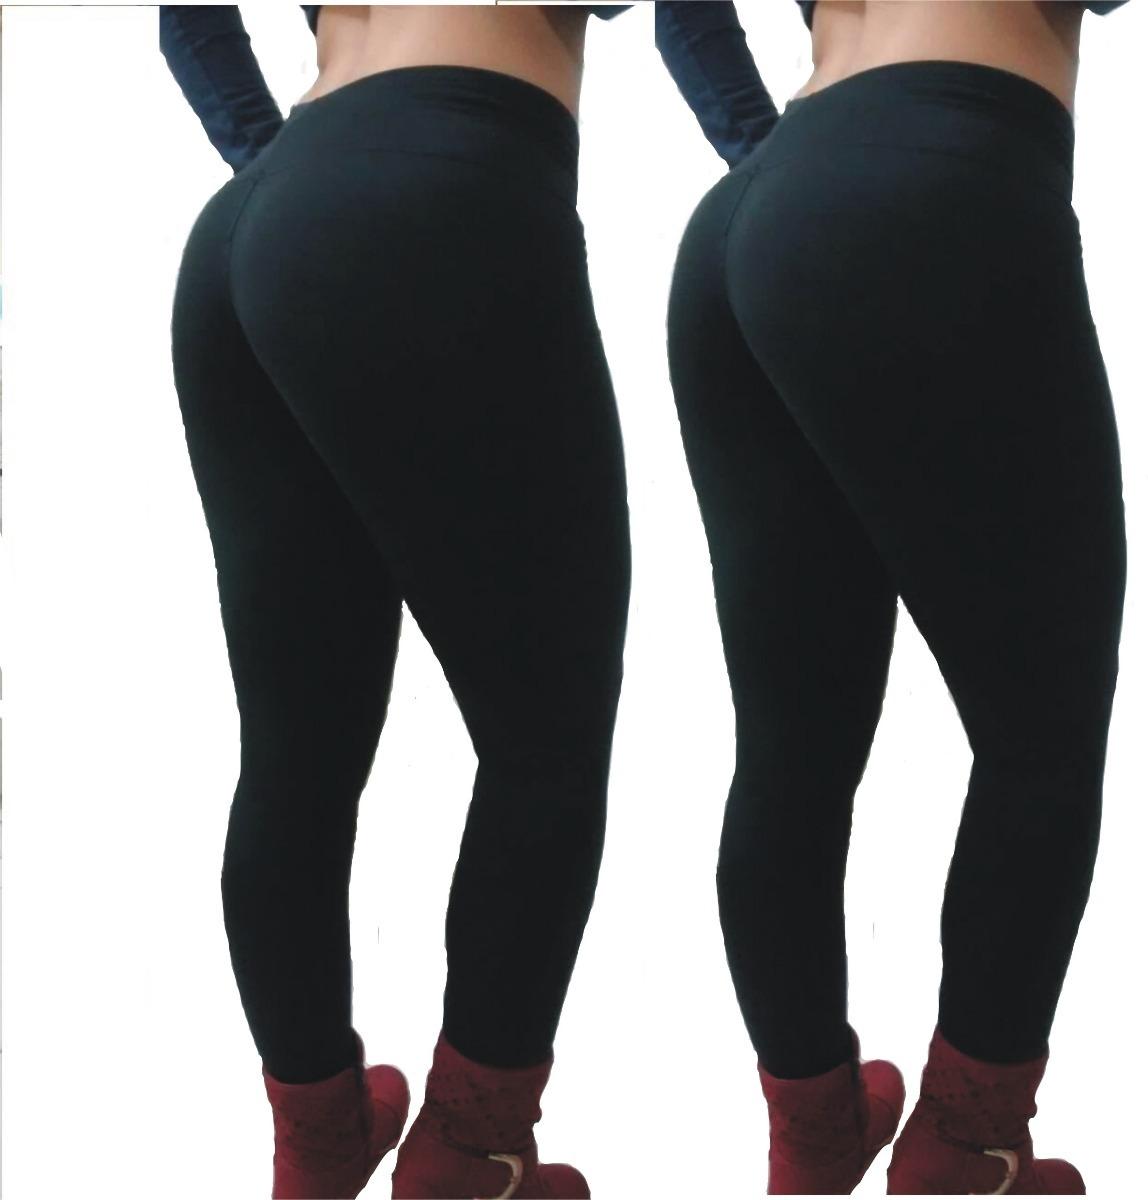 3c34b87ff kit 5 legging plus size calça inverno termica suplex grossa. Carregando zoom .